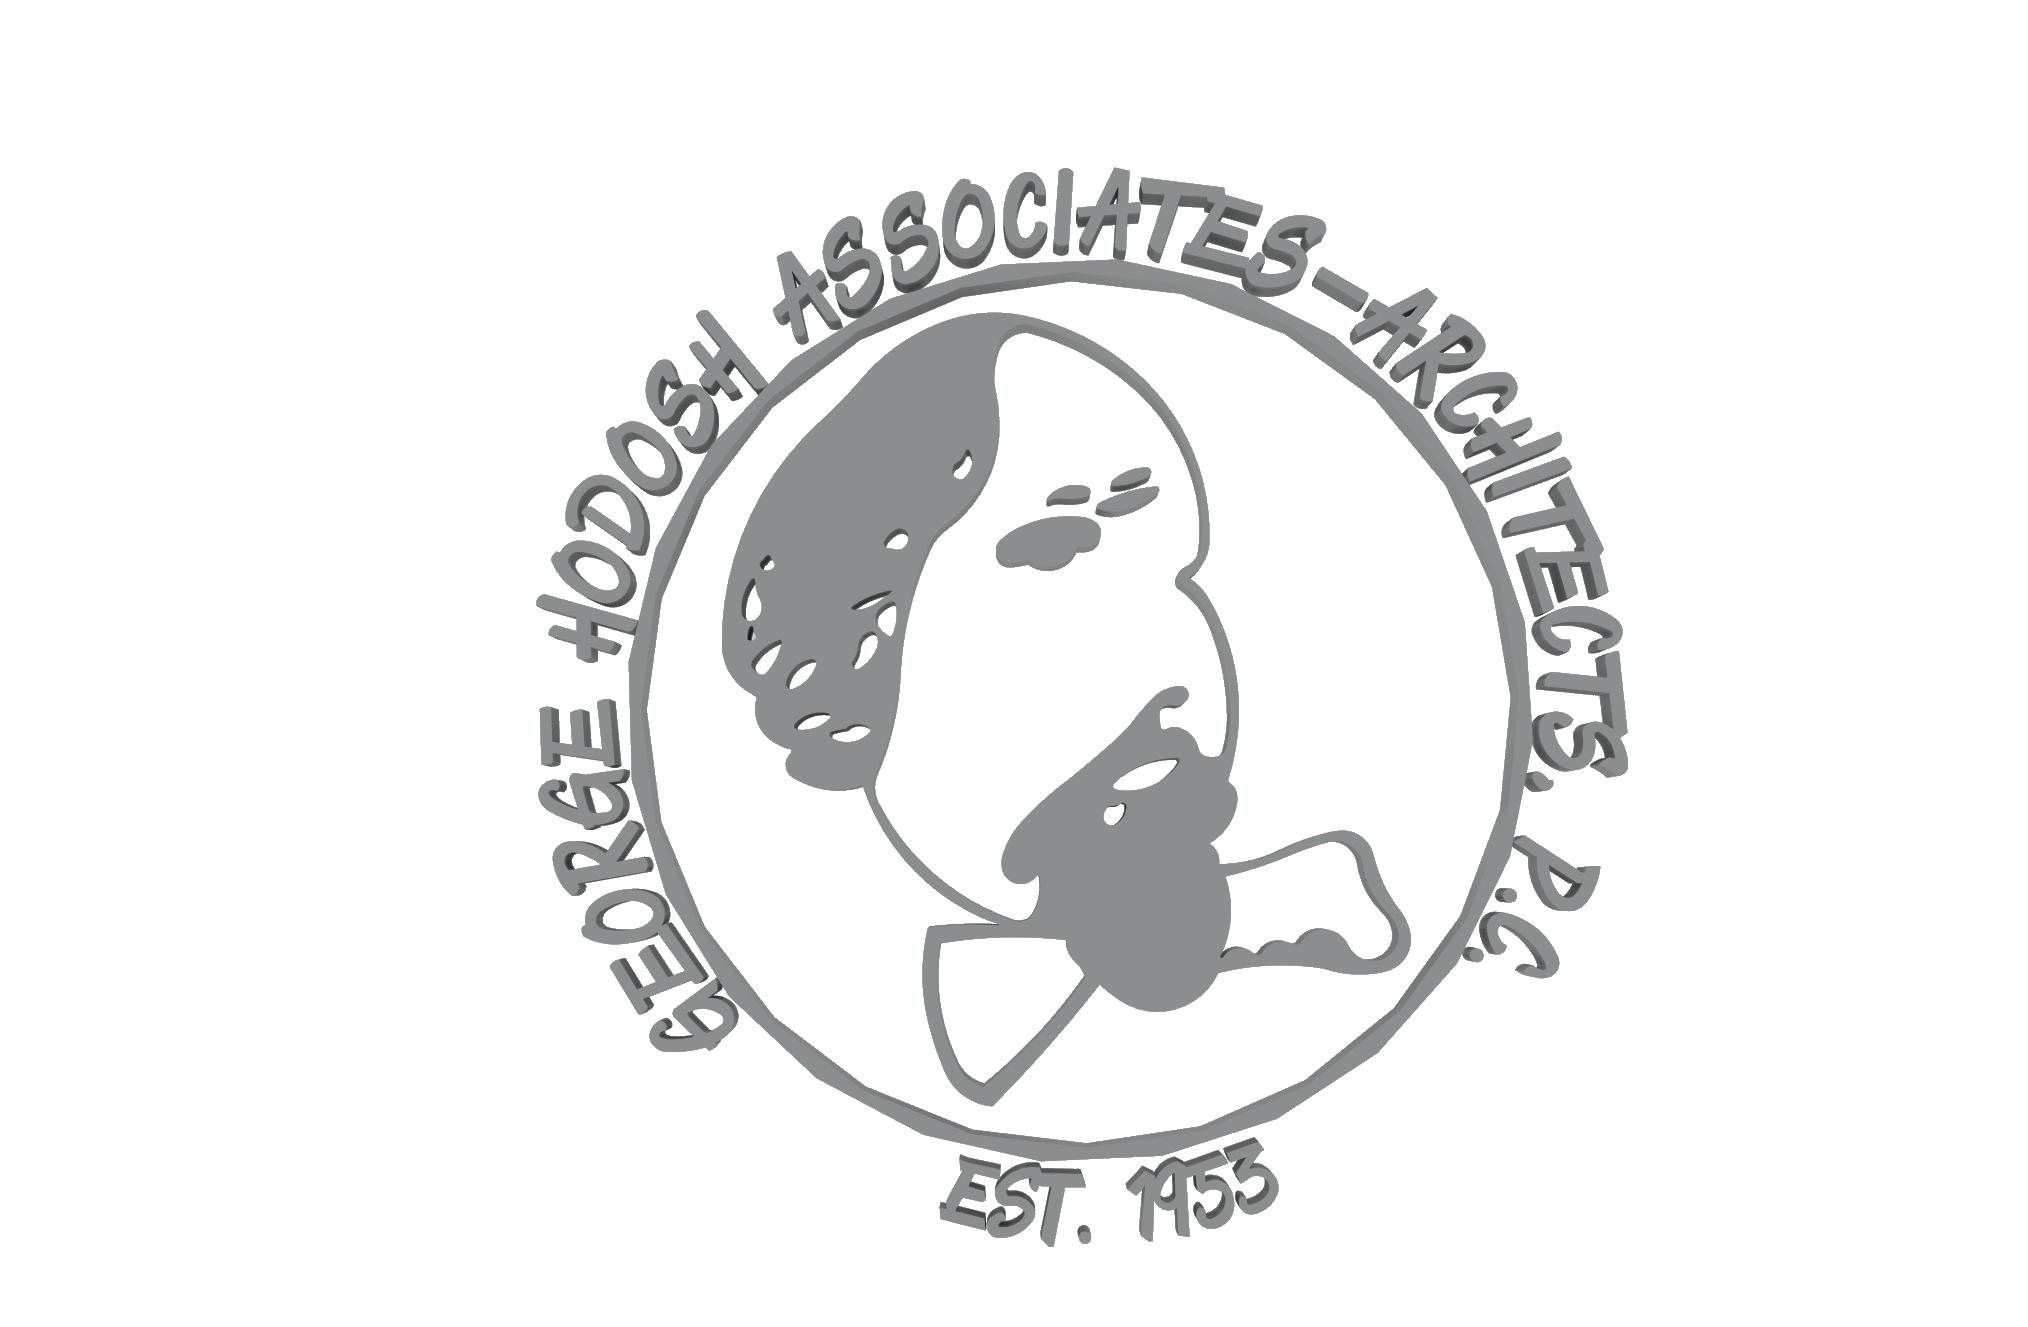 George Hodosh Associates - Architects P.C.